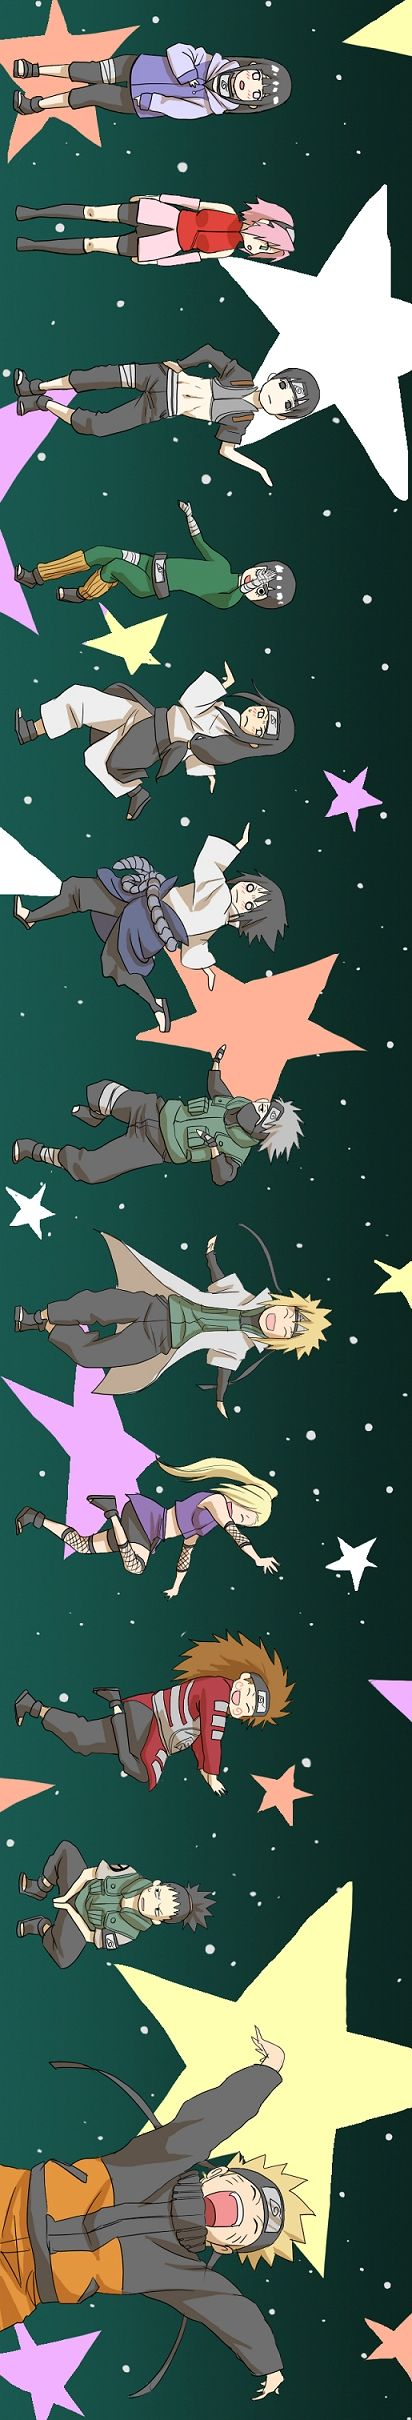 It's the dance moves to Pinocchio right? Konoha 11+ Kakashi & Minato